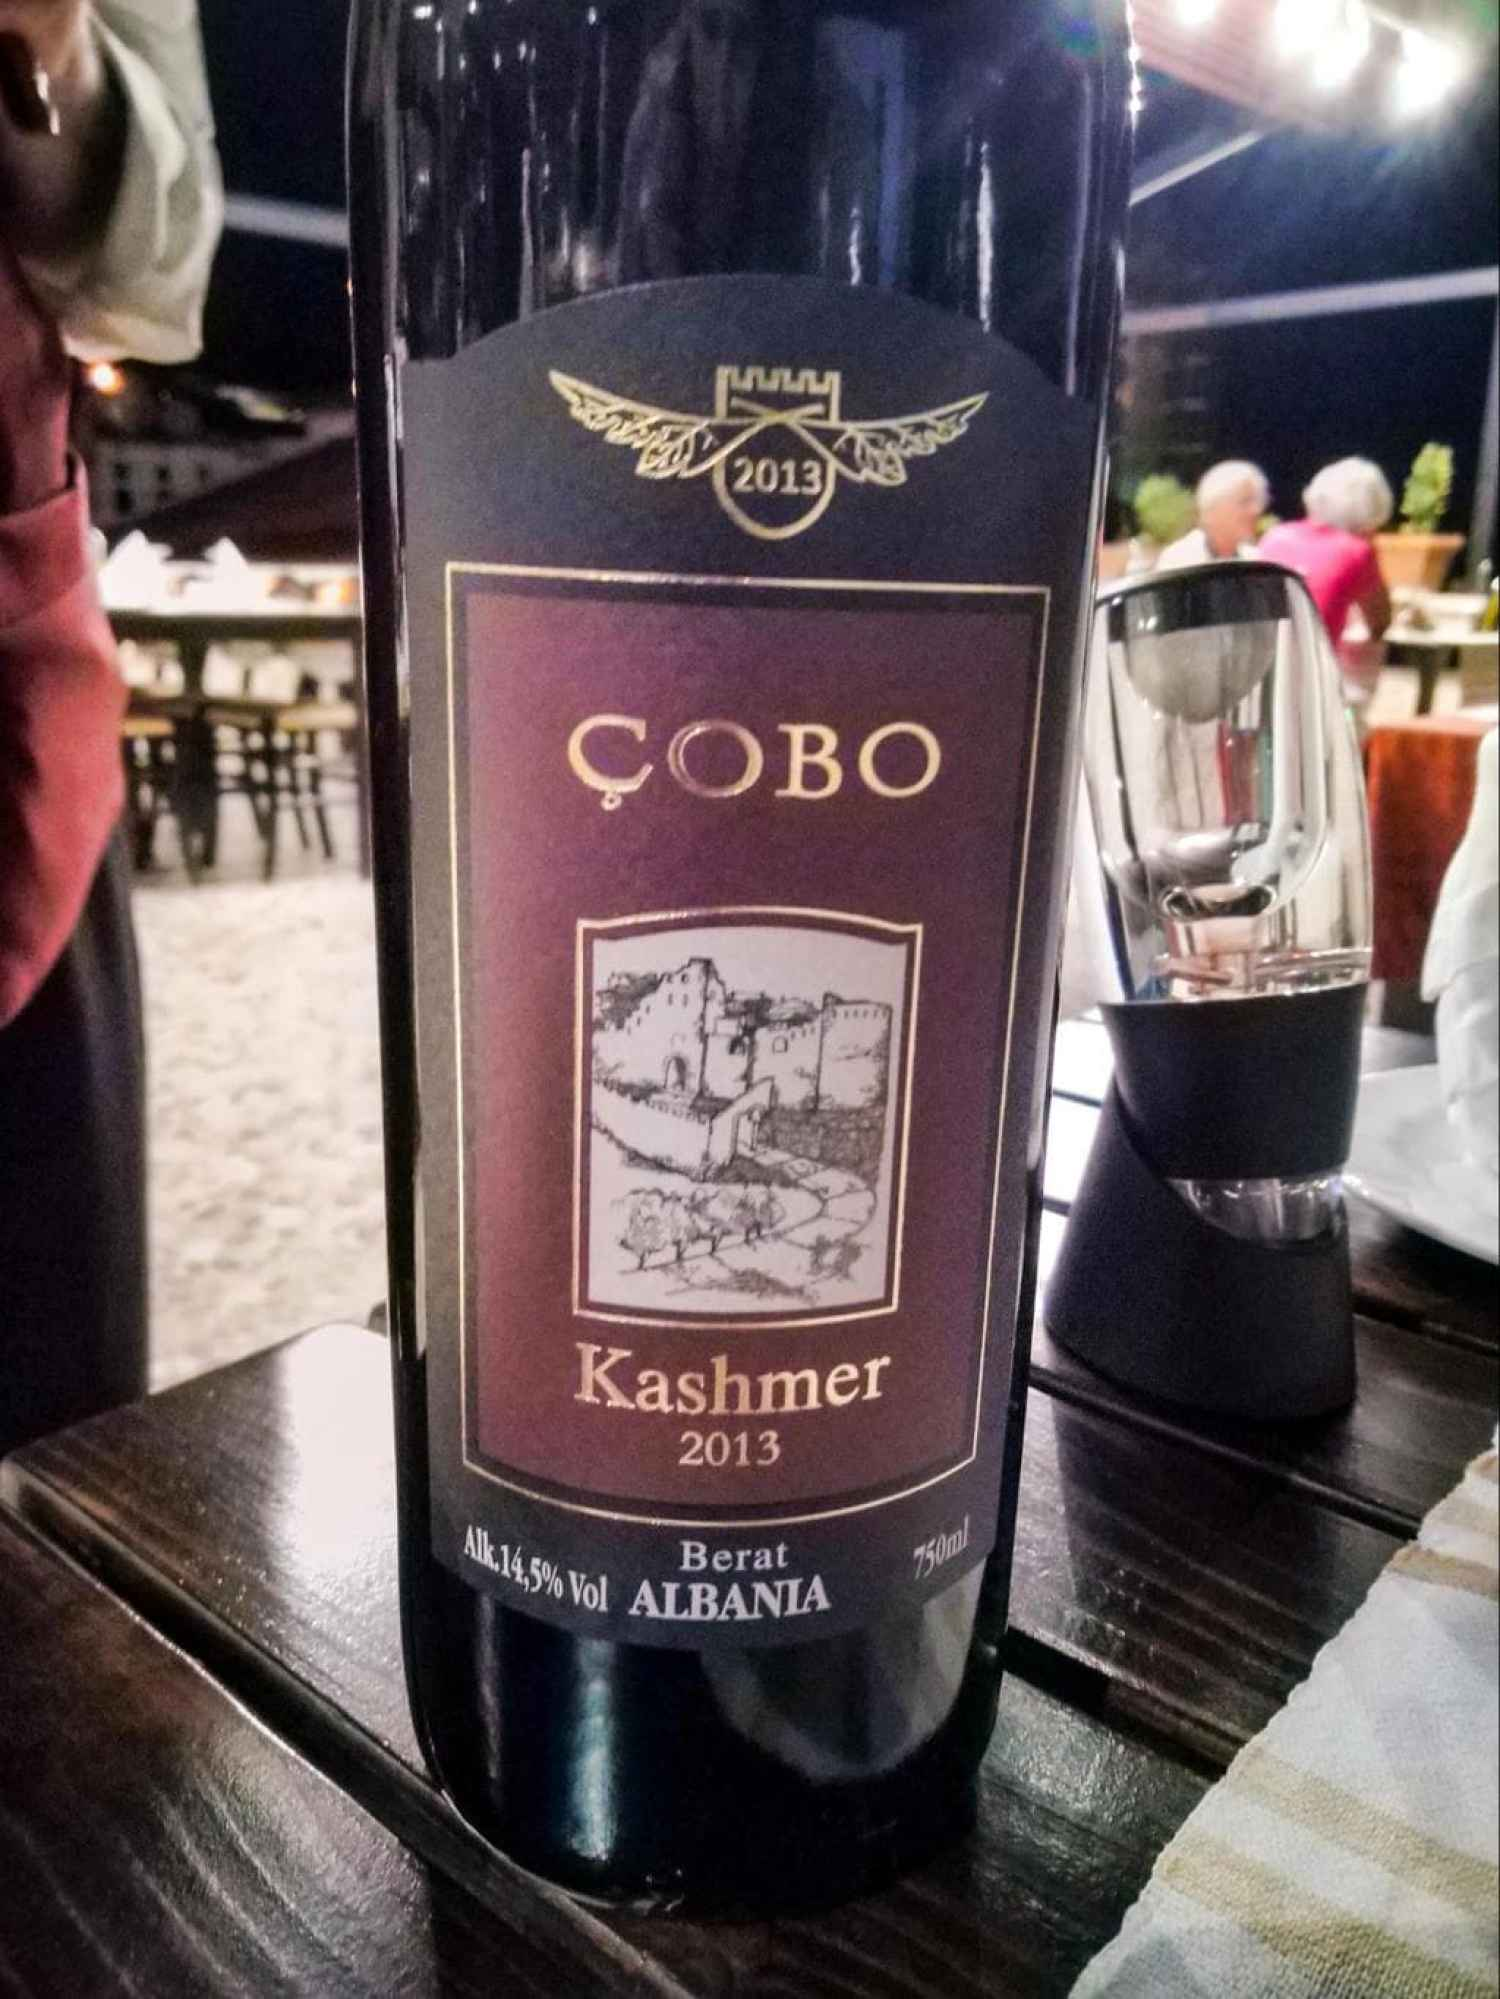 Çobo Winery 2013 Kashmer